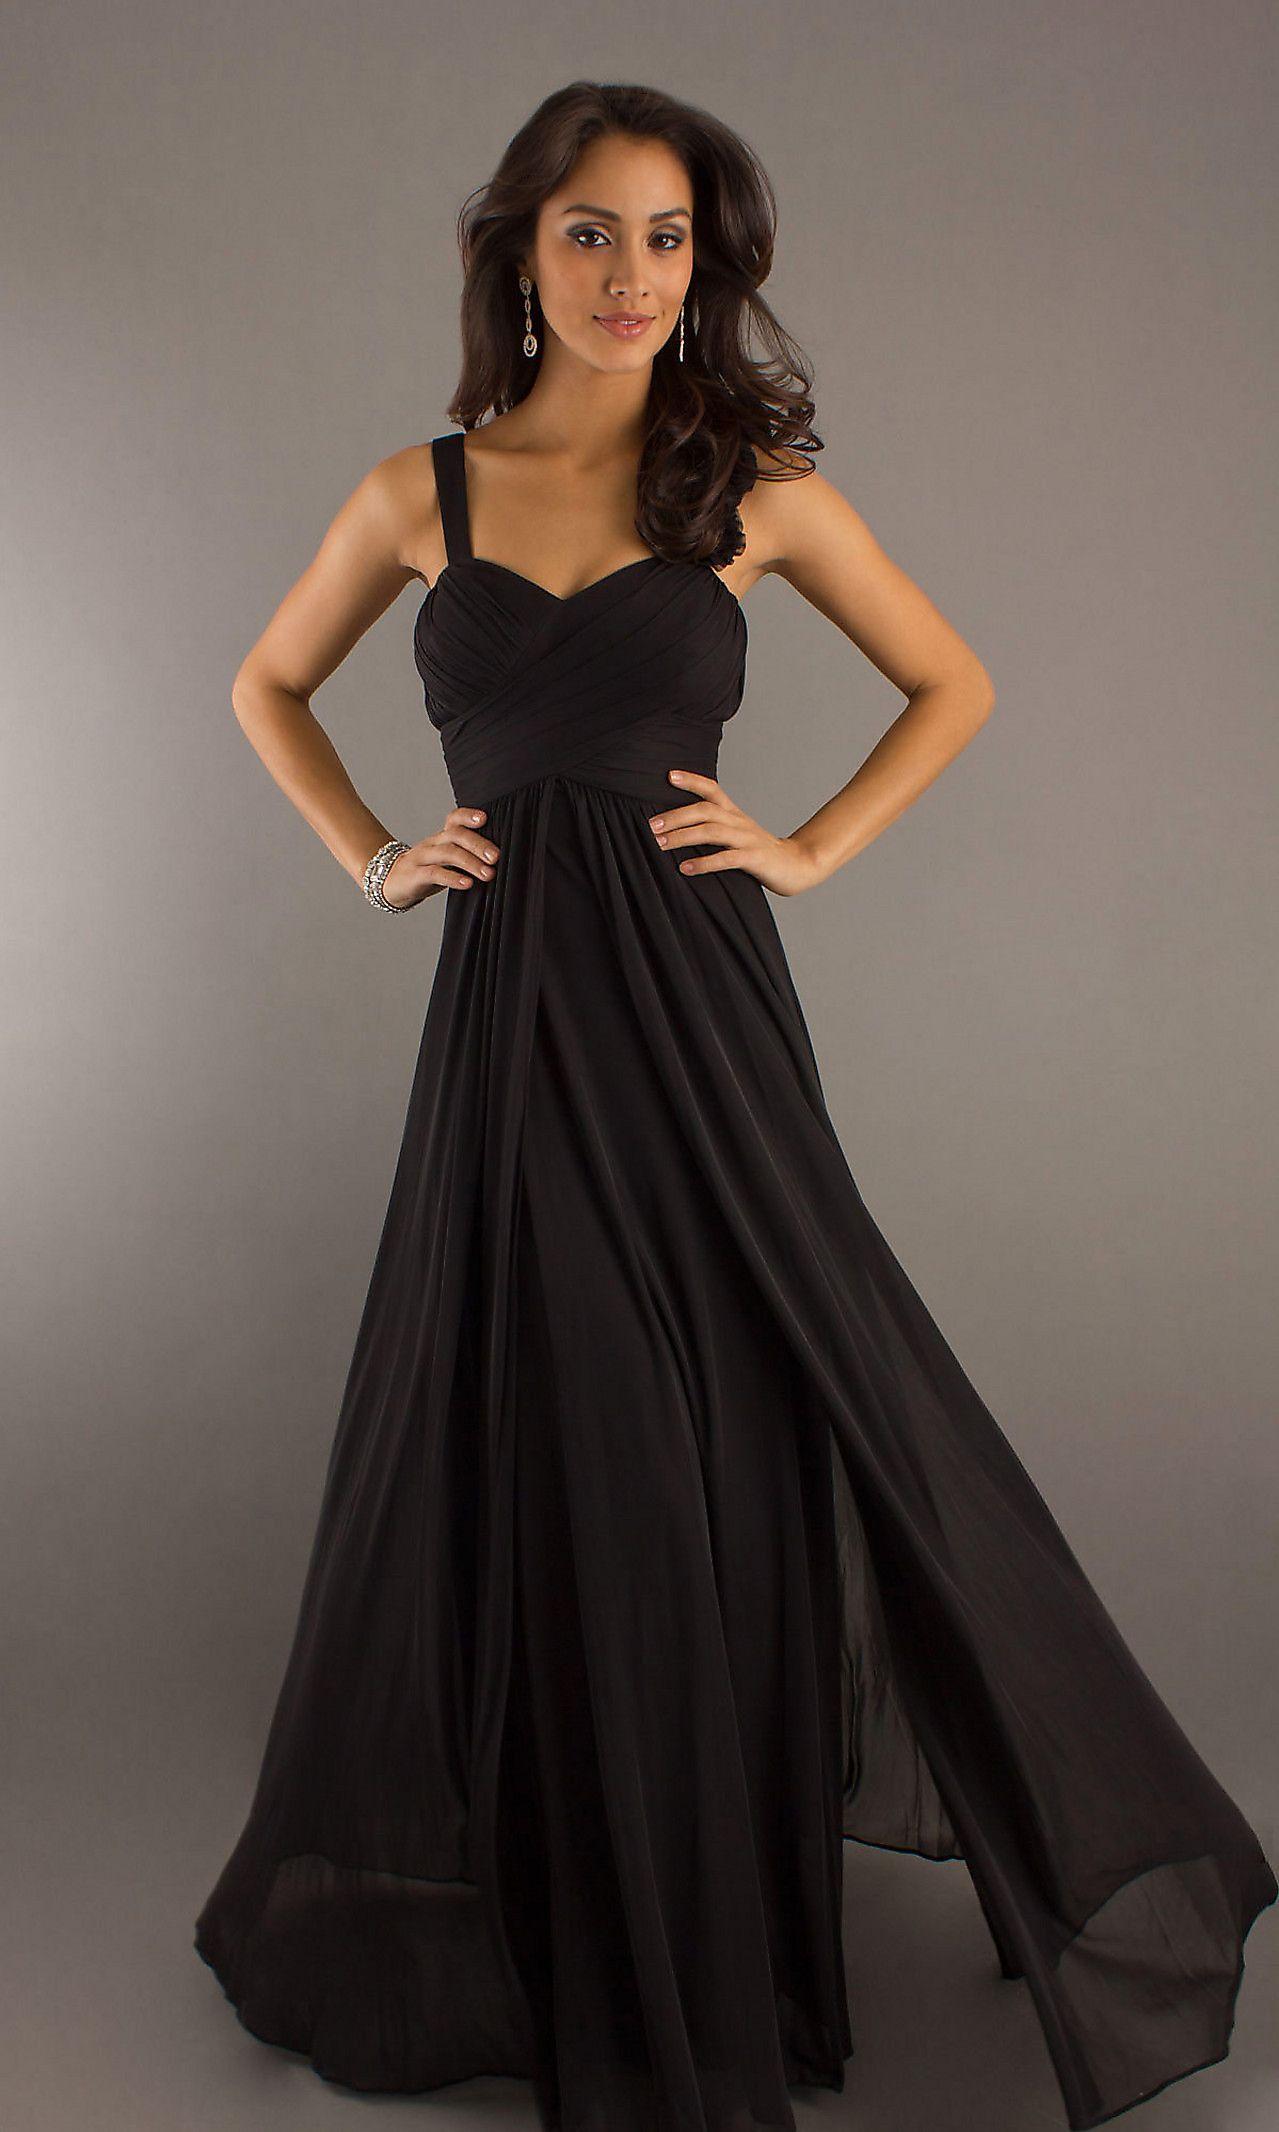 Long Formal Dress For Prom Black Chiffon Bridesmaid Dresses Cheap Wedding Dress Floor Length Chiffon Bridesmaid Dresses